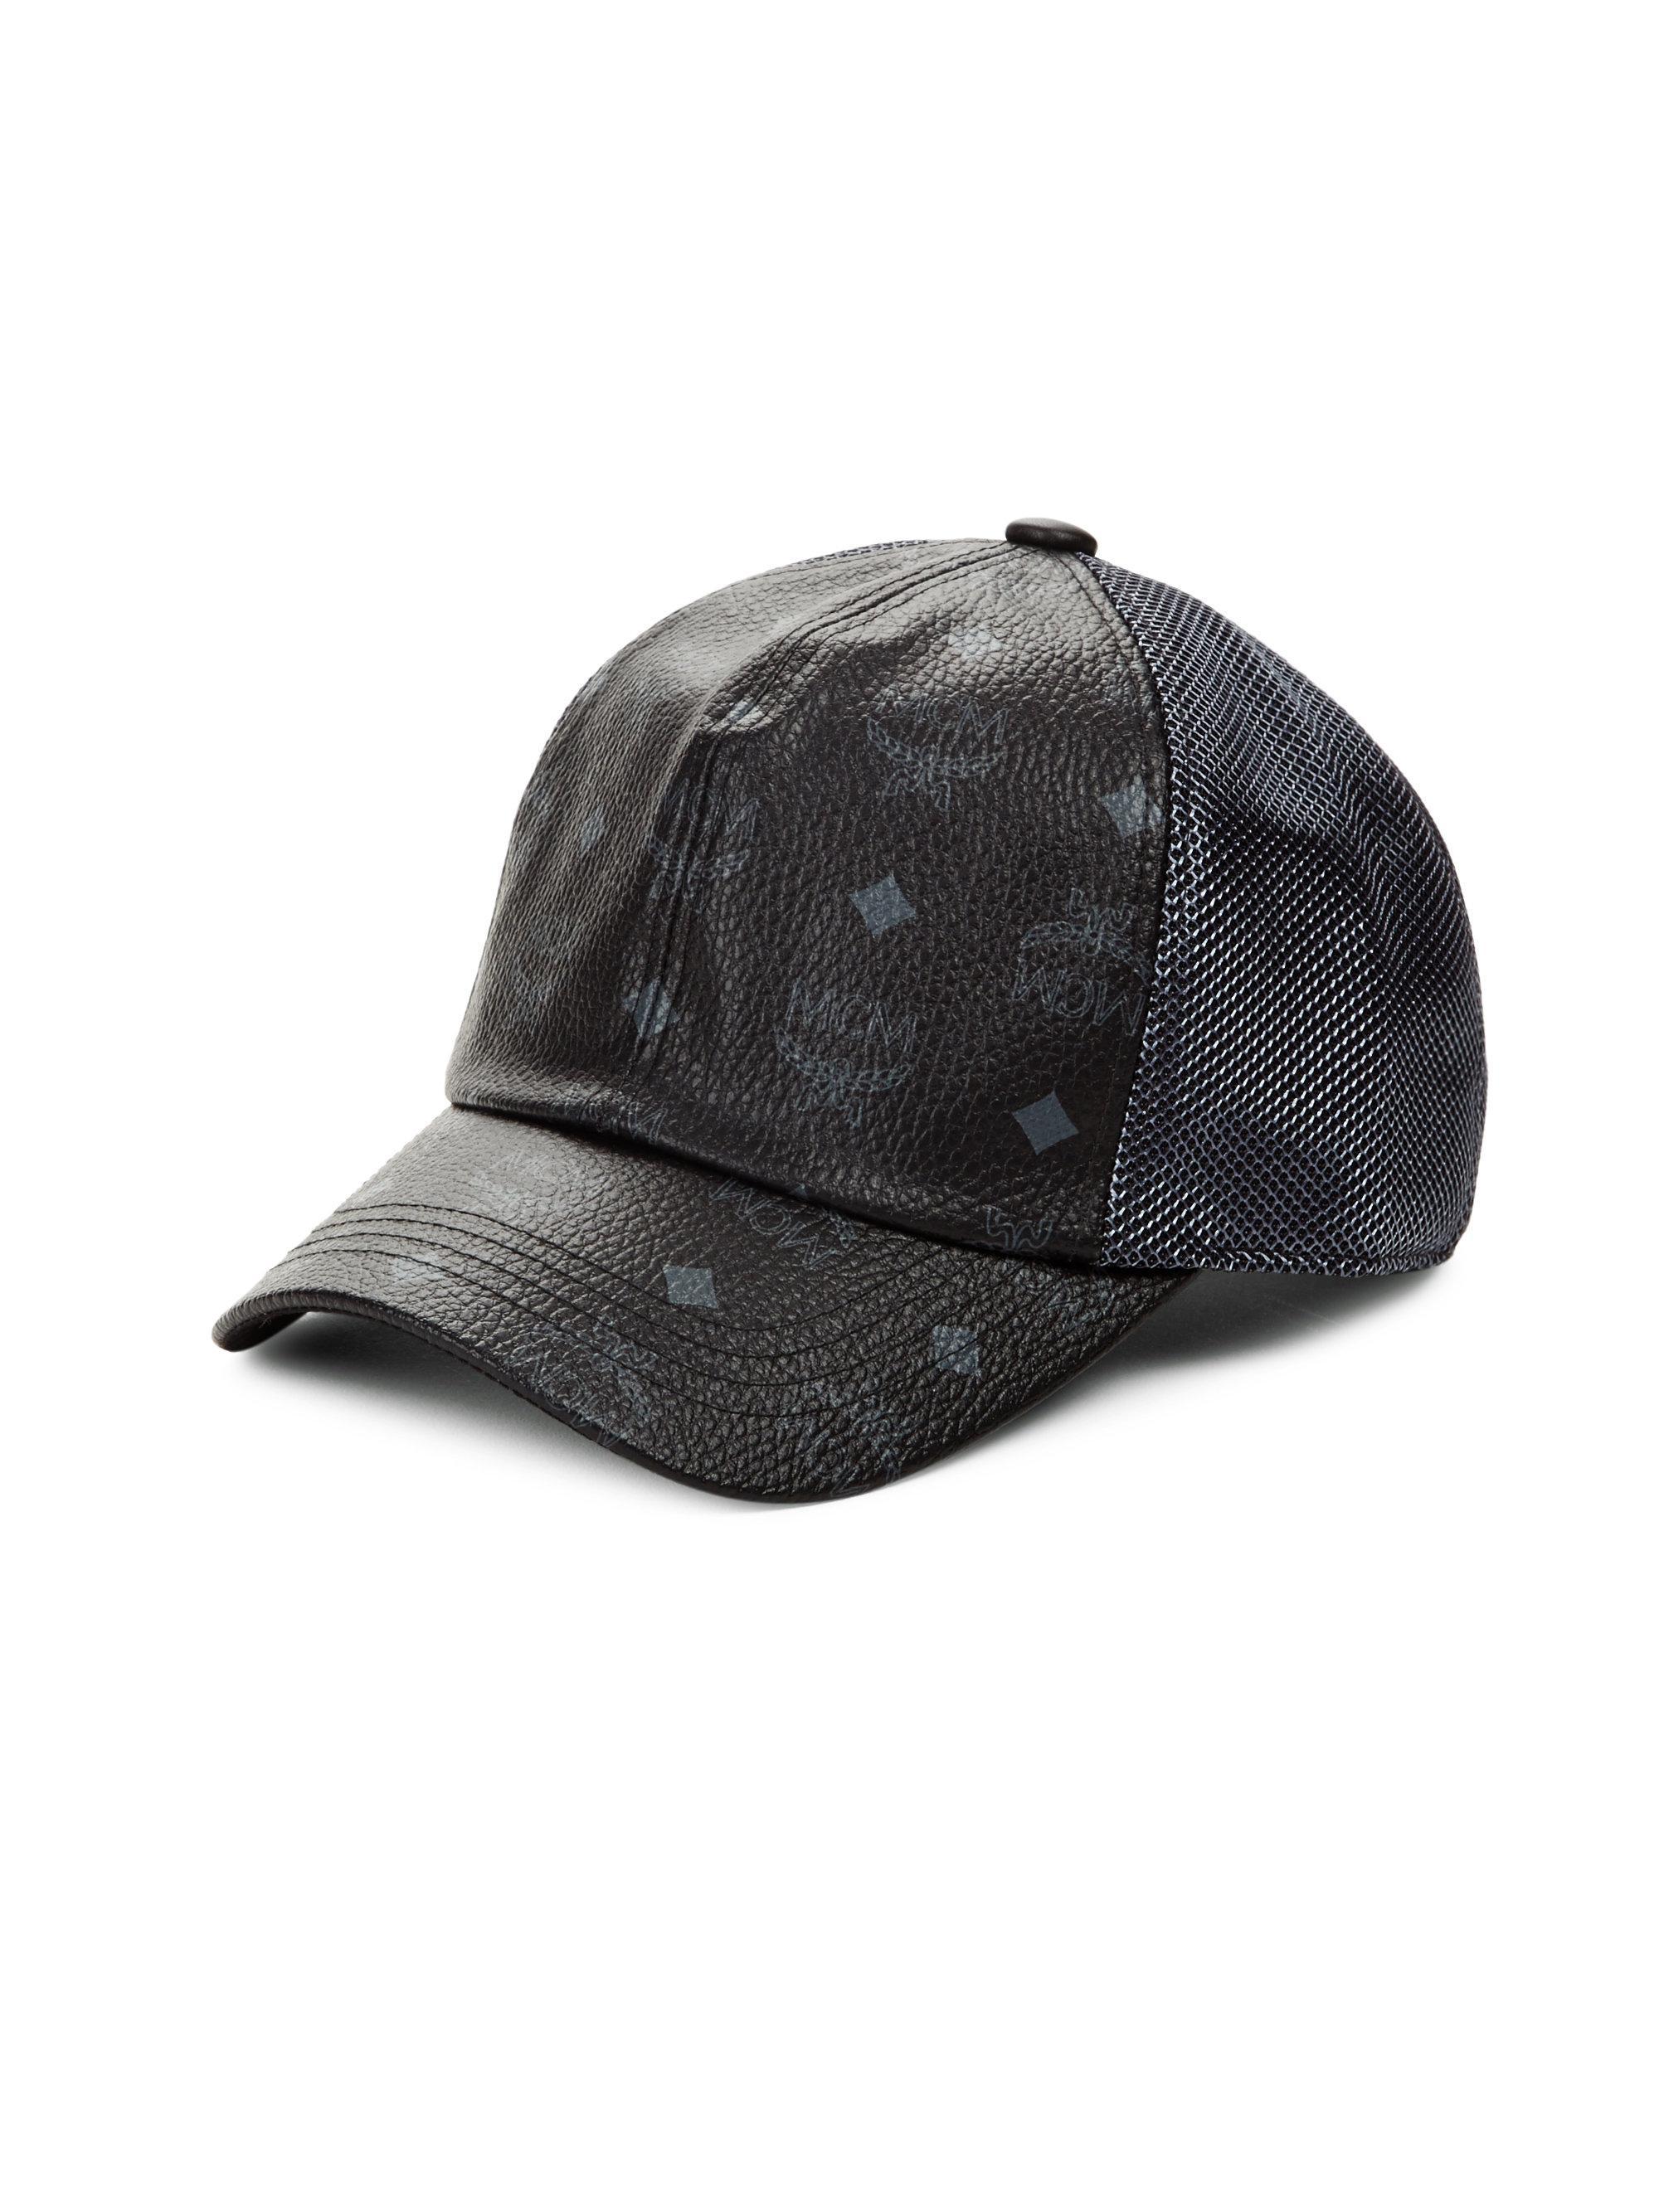 cdcc0e60916 Mcm Collection Visetos Cap in Black for Men - Save 1% - Lyst